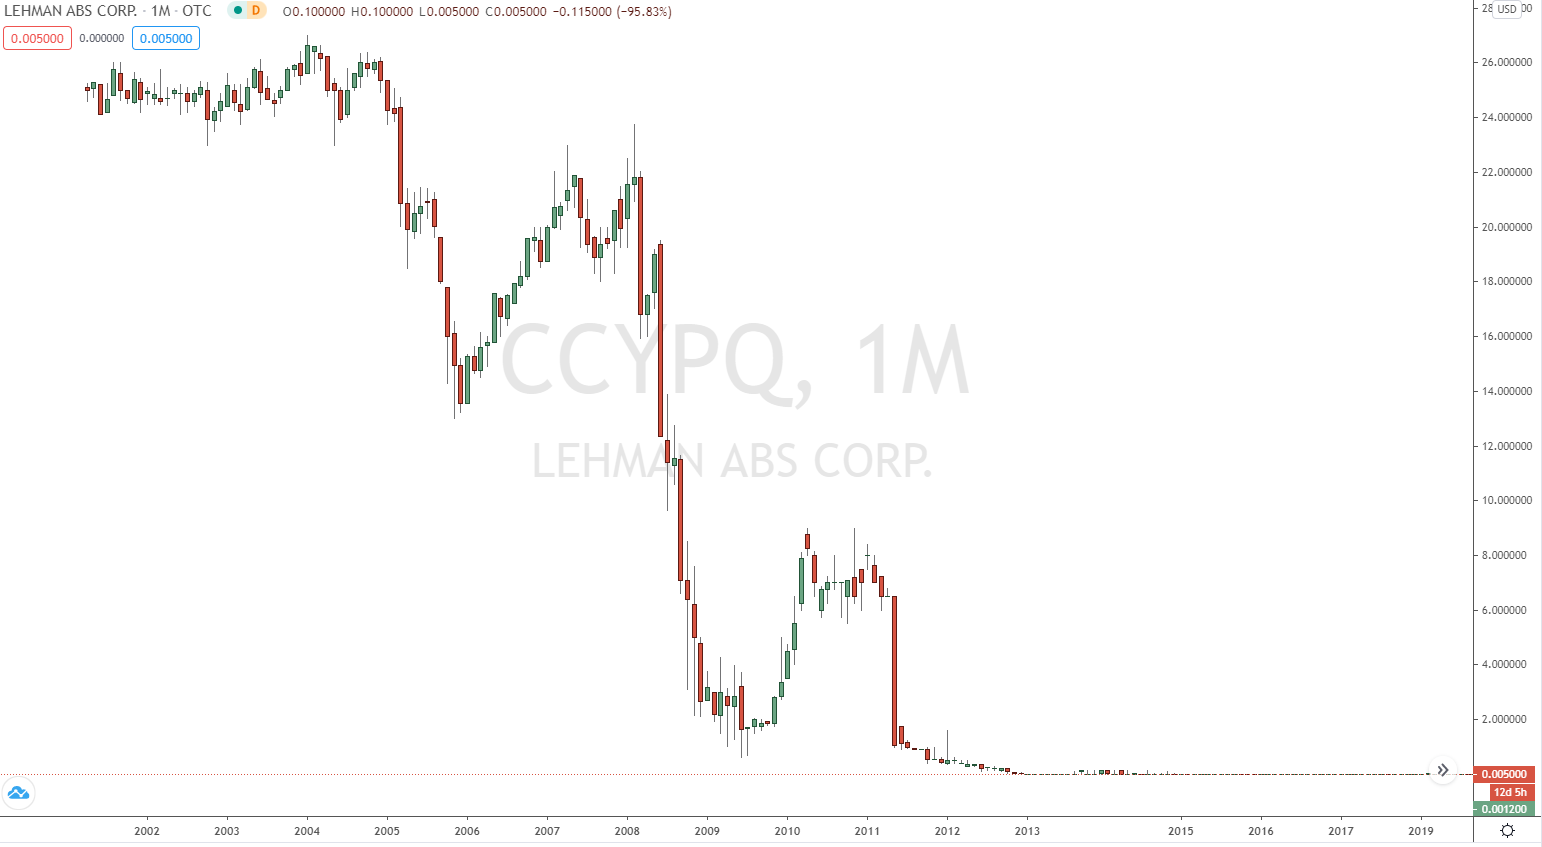 Großer Crash 2008 mit Lehman Brothers